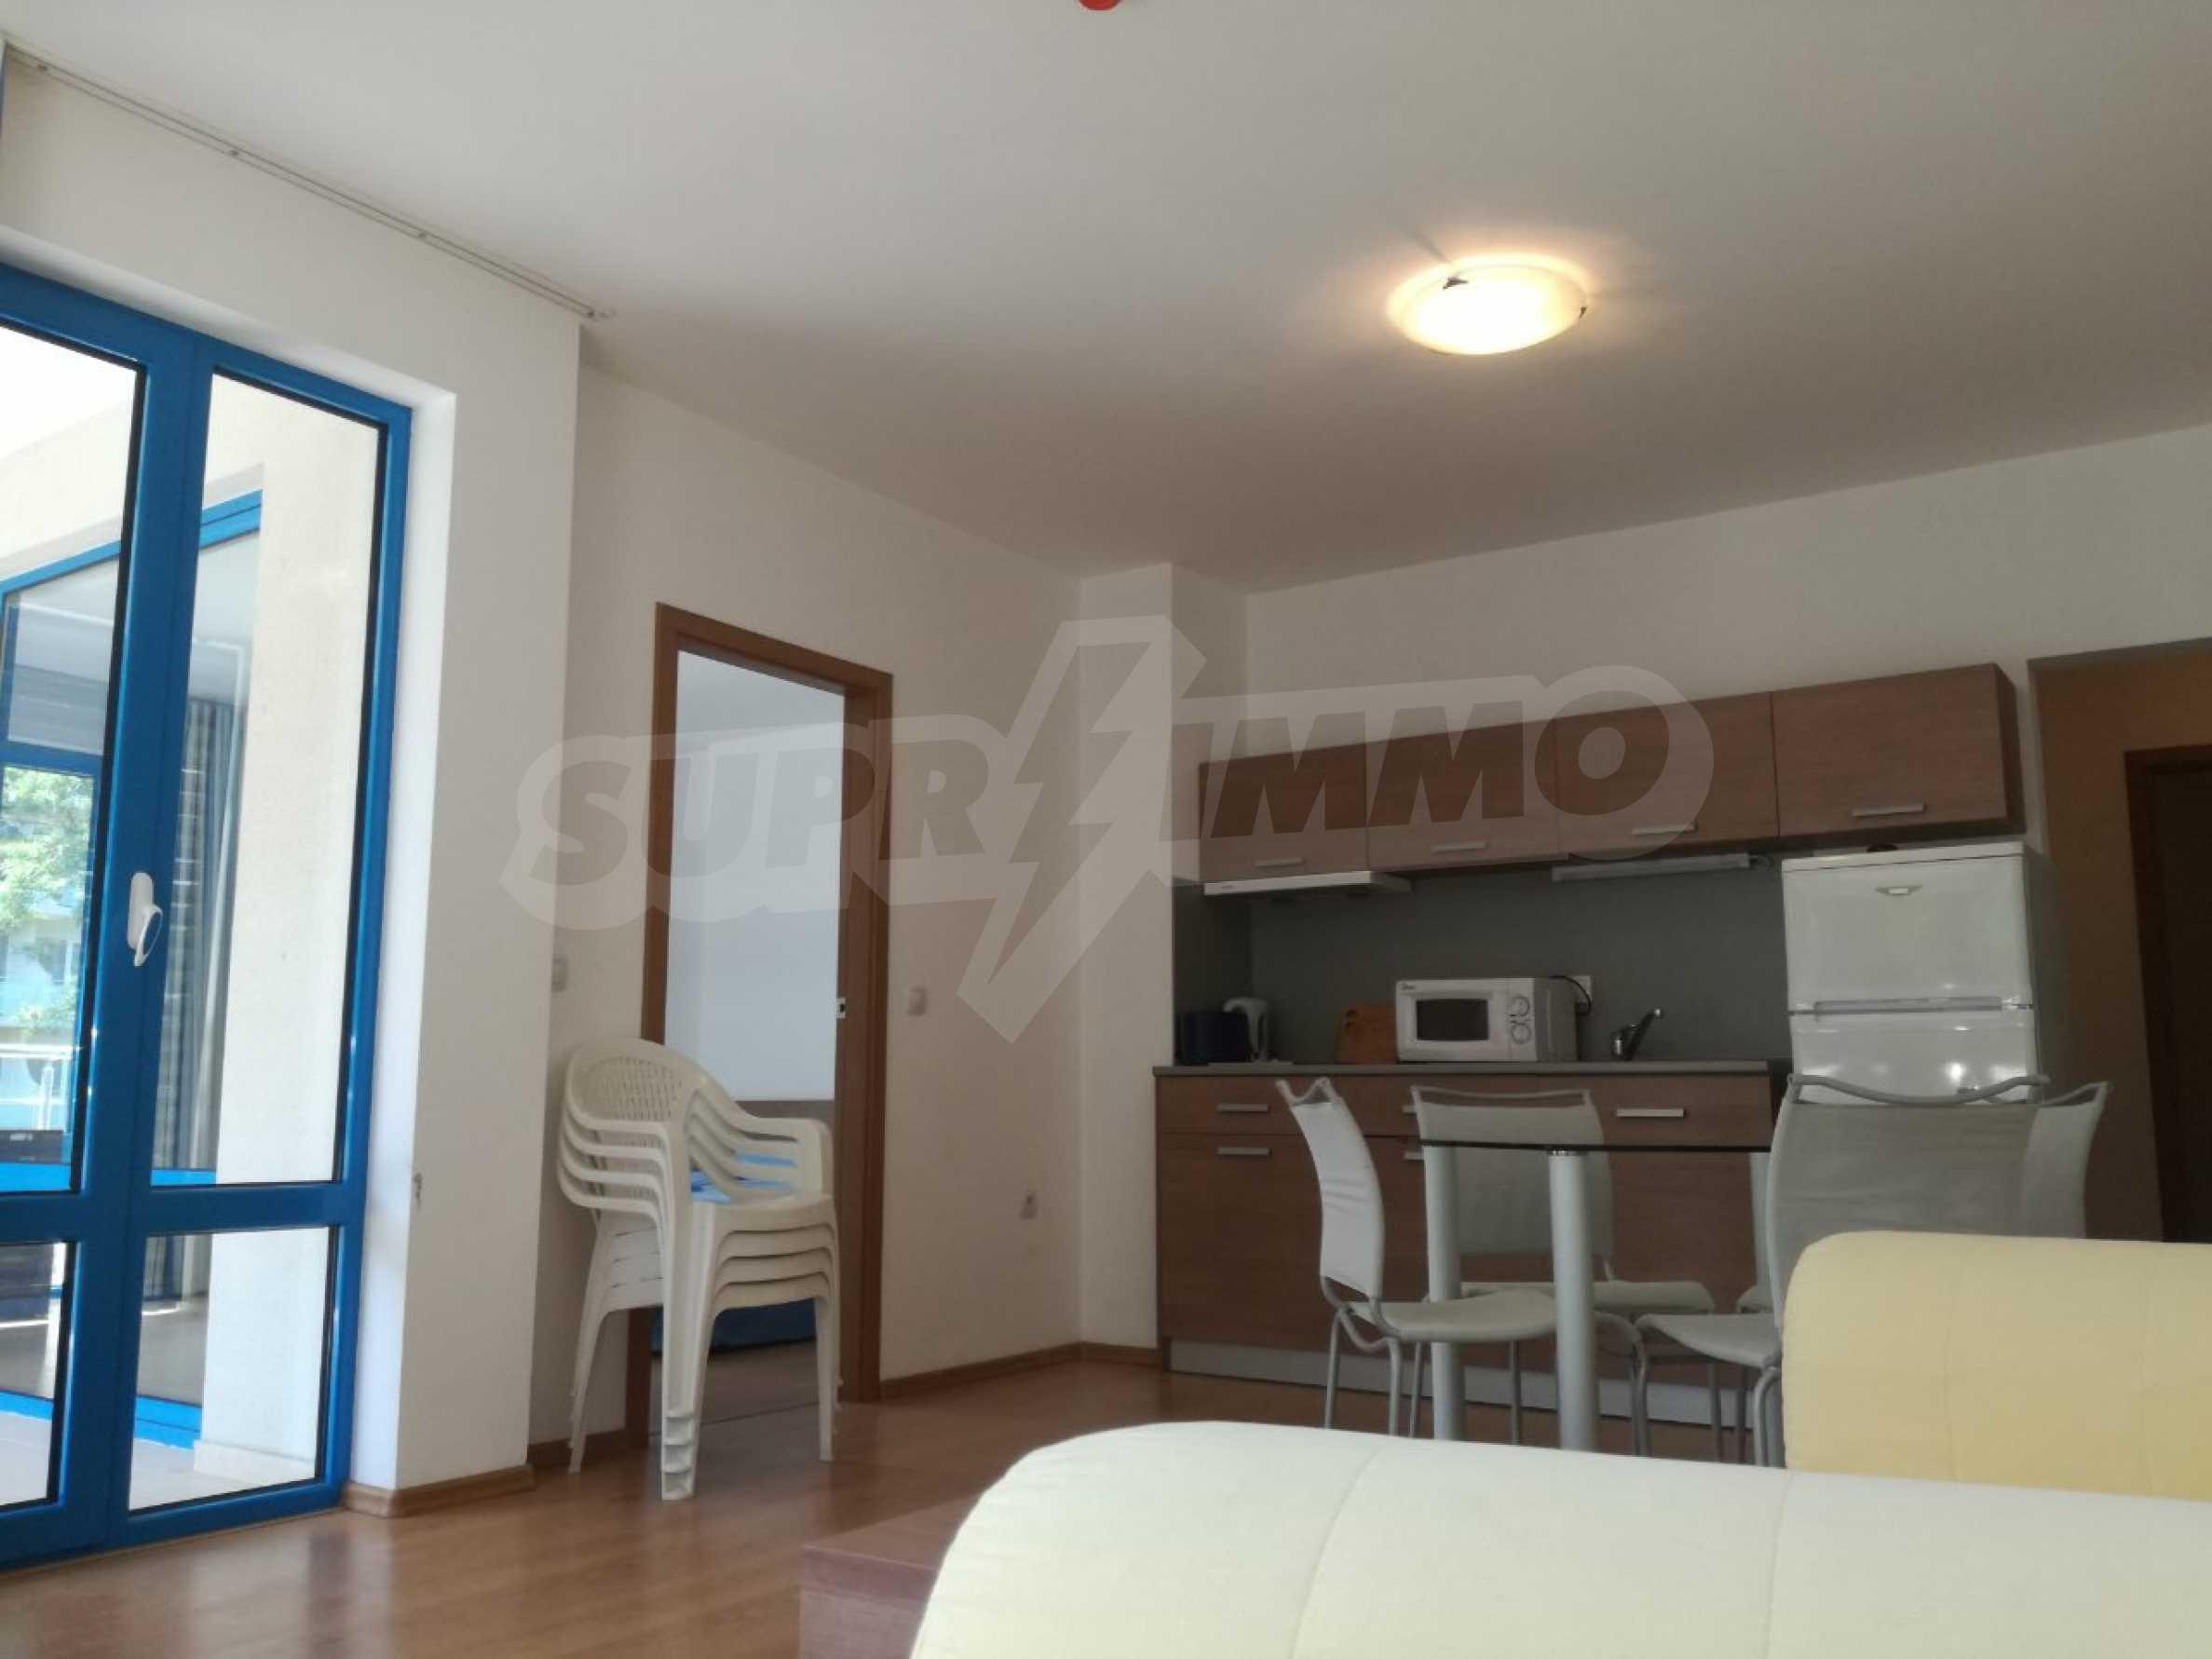 Страхотен тристаен апартамент в Слънчев бряг 7